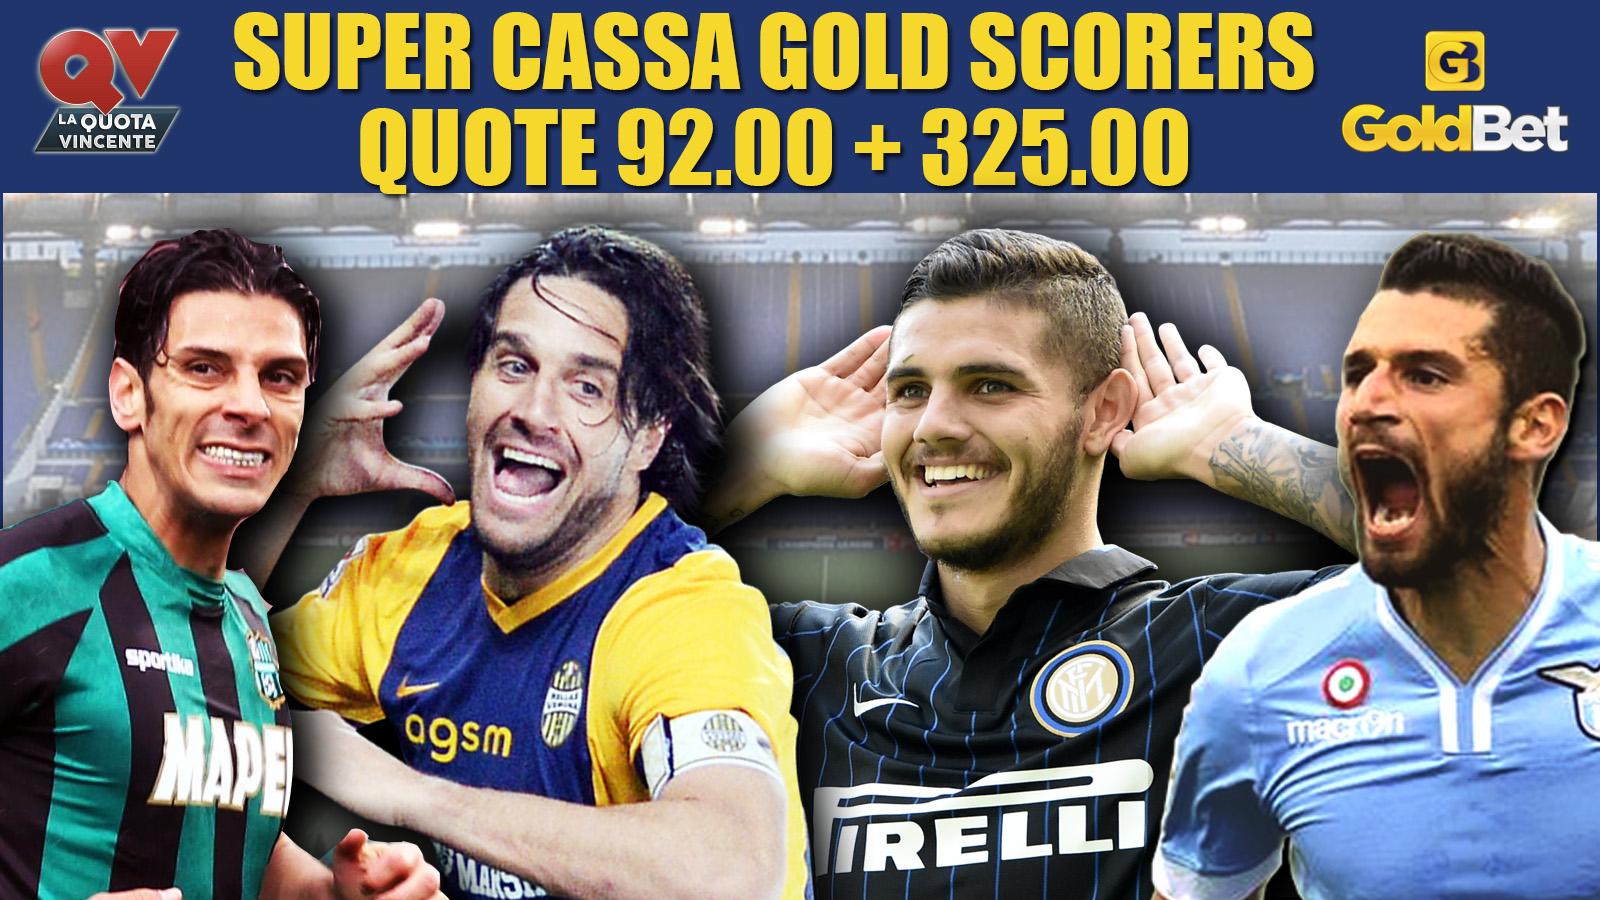 Verona_Sassuolo_Floccari_Toni_Icardi_Inter_Candreva_Lazio_goldscorers_goldbet_scommesse_quote